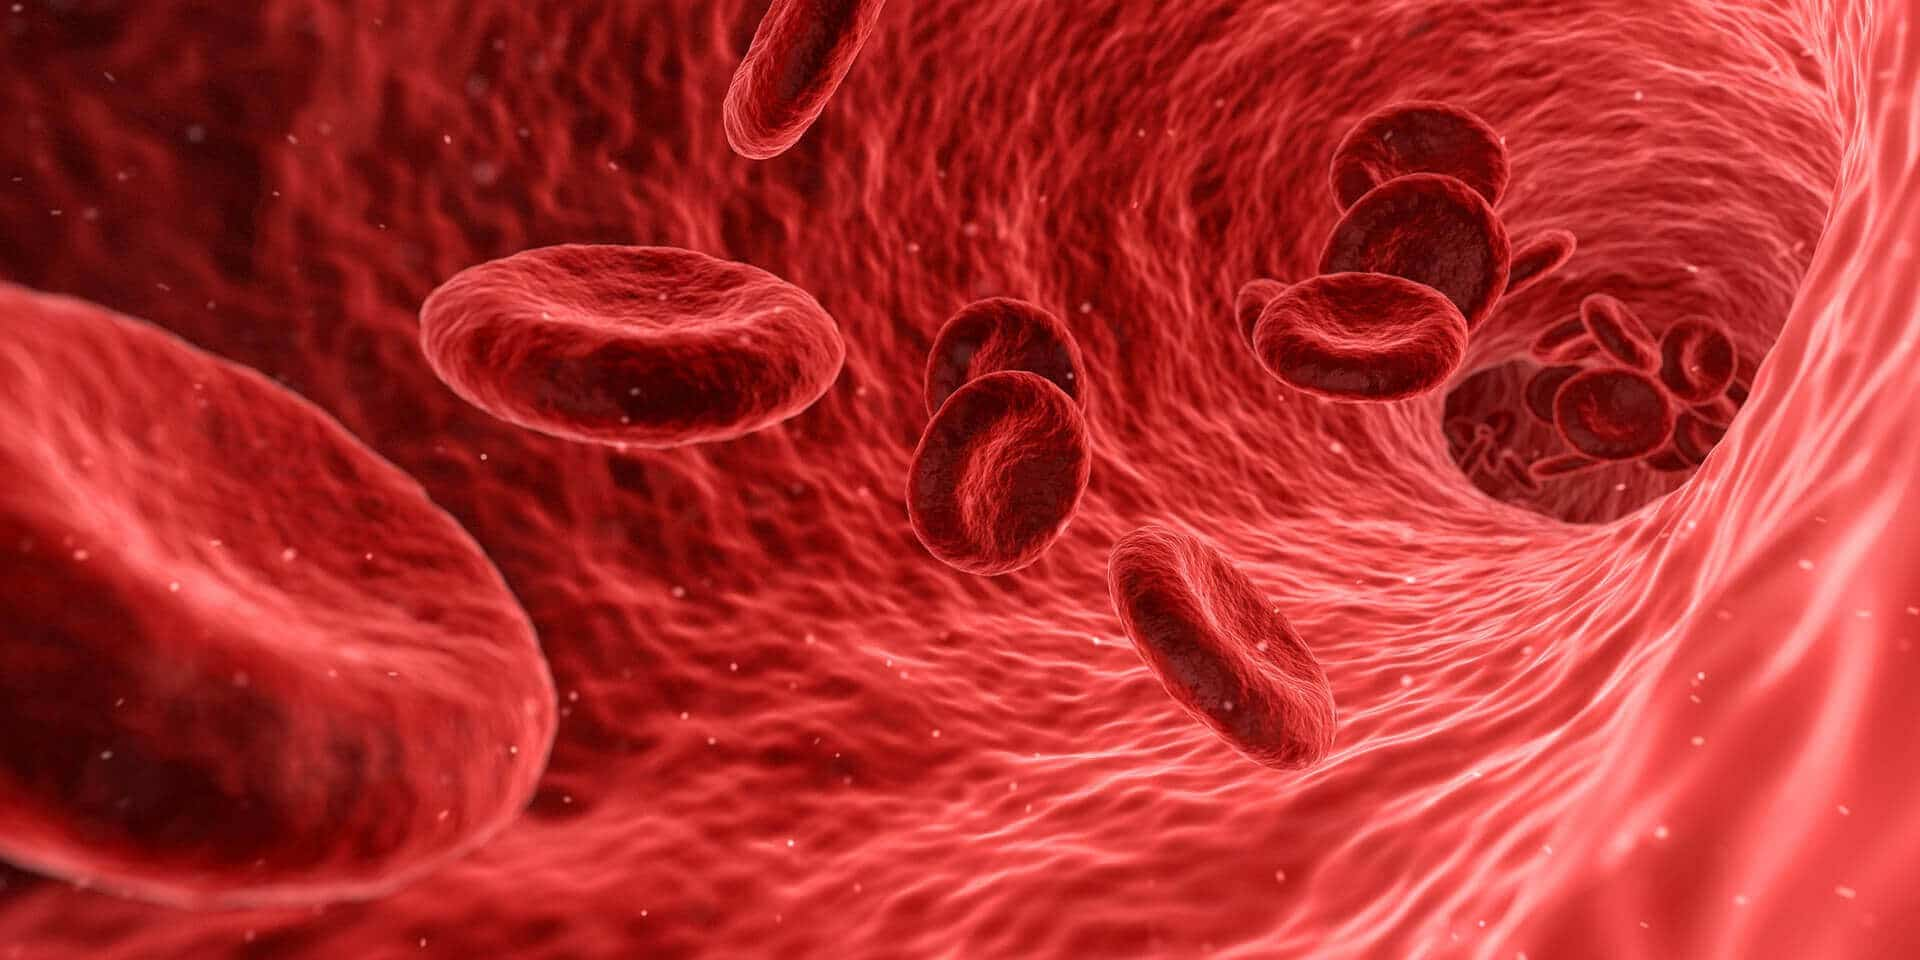 Blood flow